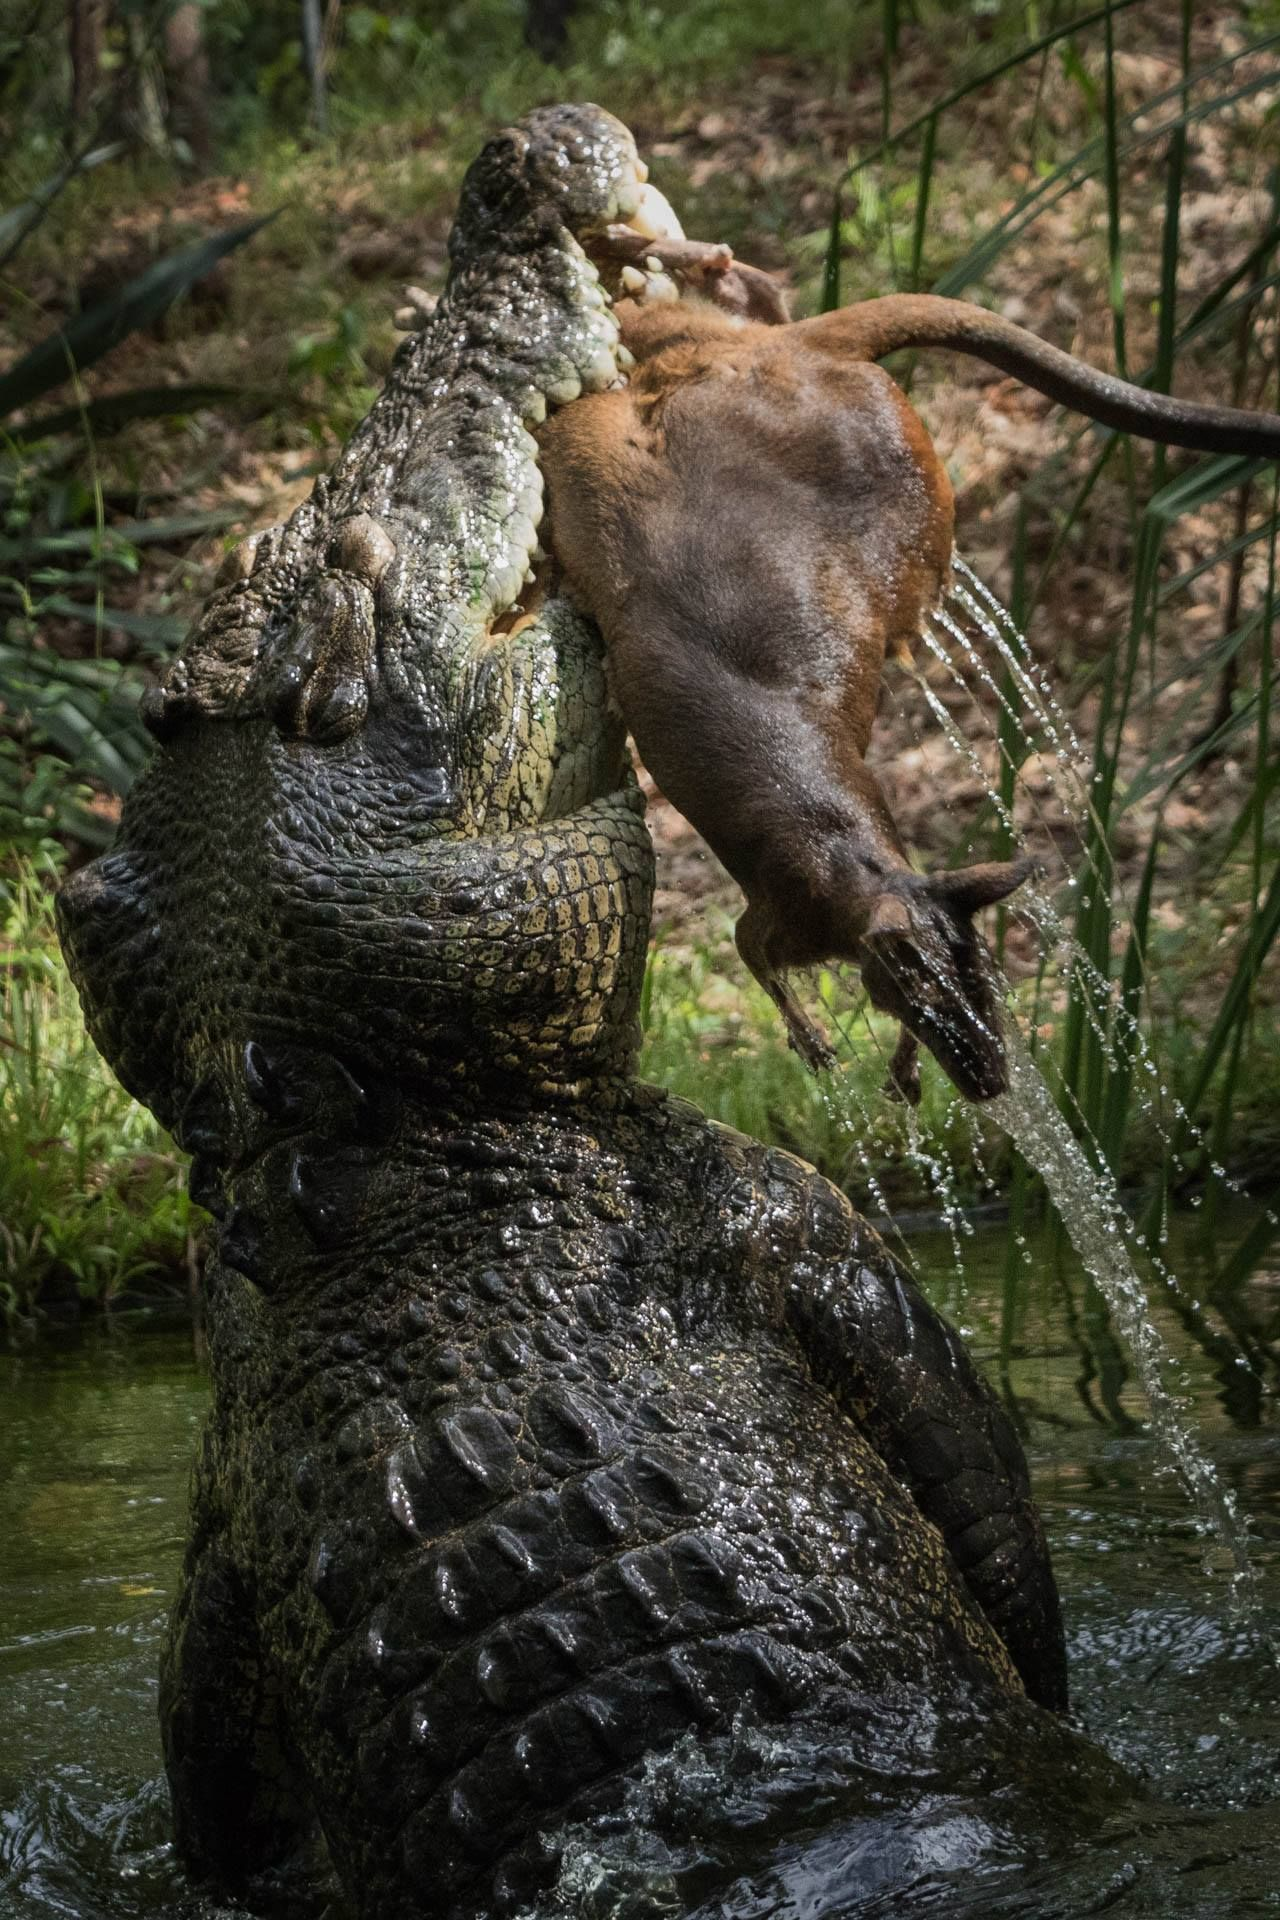 Pin de VIKI... en WOOOW !!!... | Pinterest | Naturaleza, Animales y ...